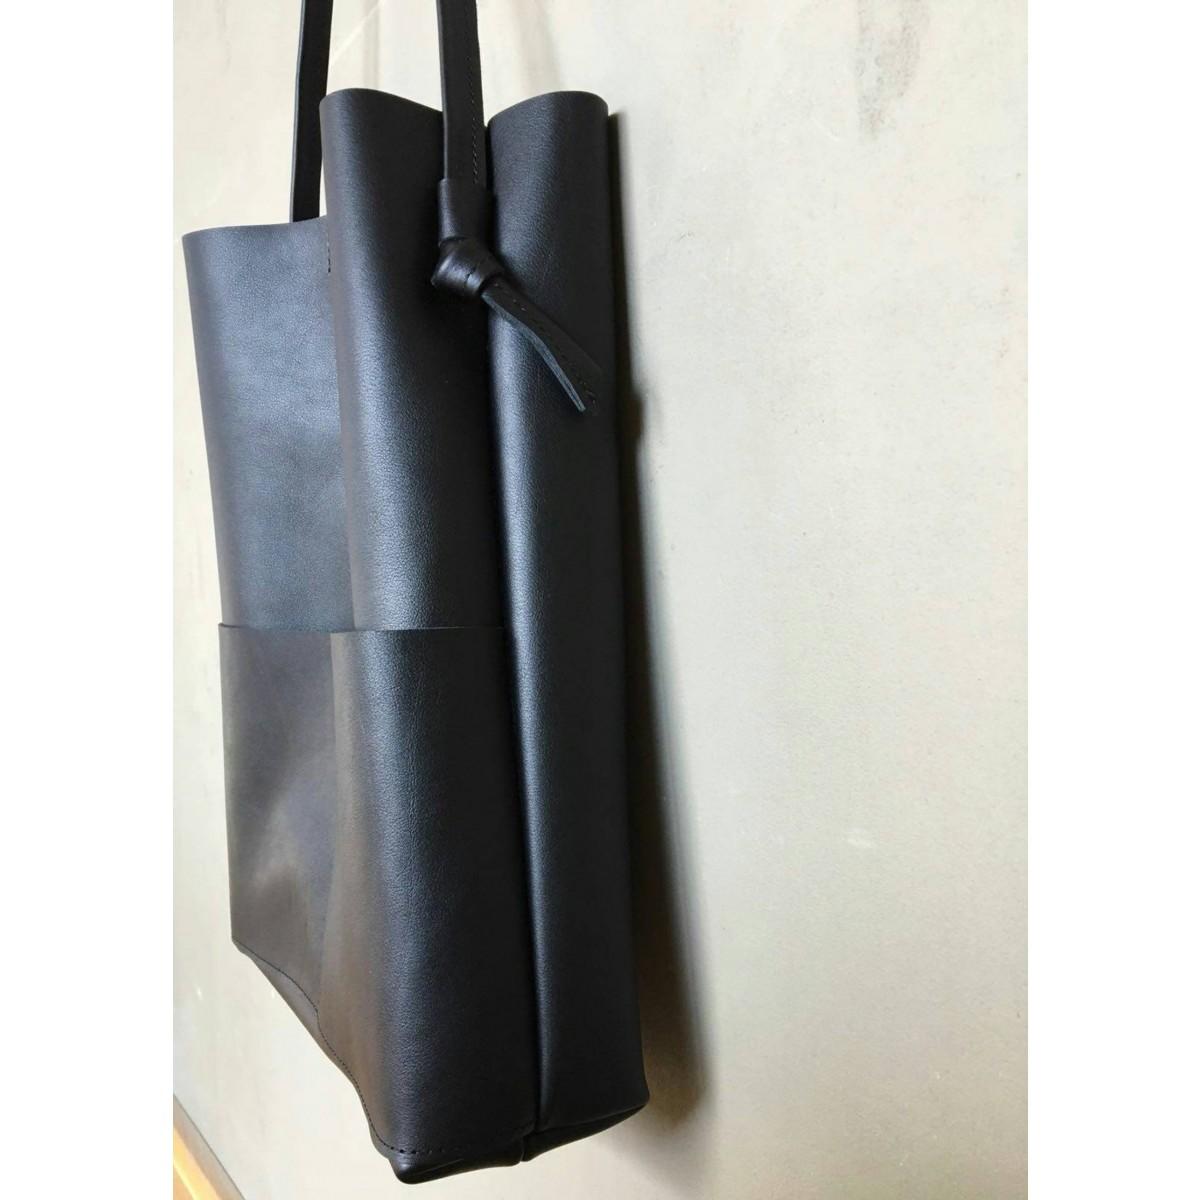 BSAITE / Schwarze Leder Beuteltasche / Boho Bag